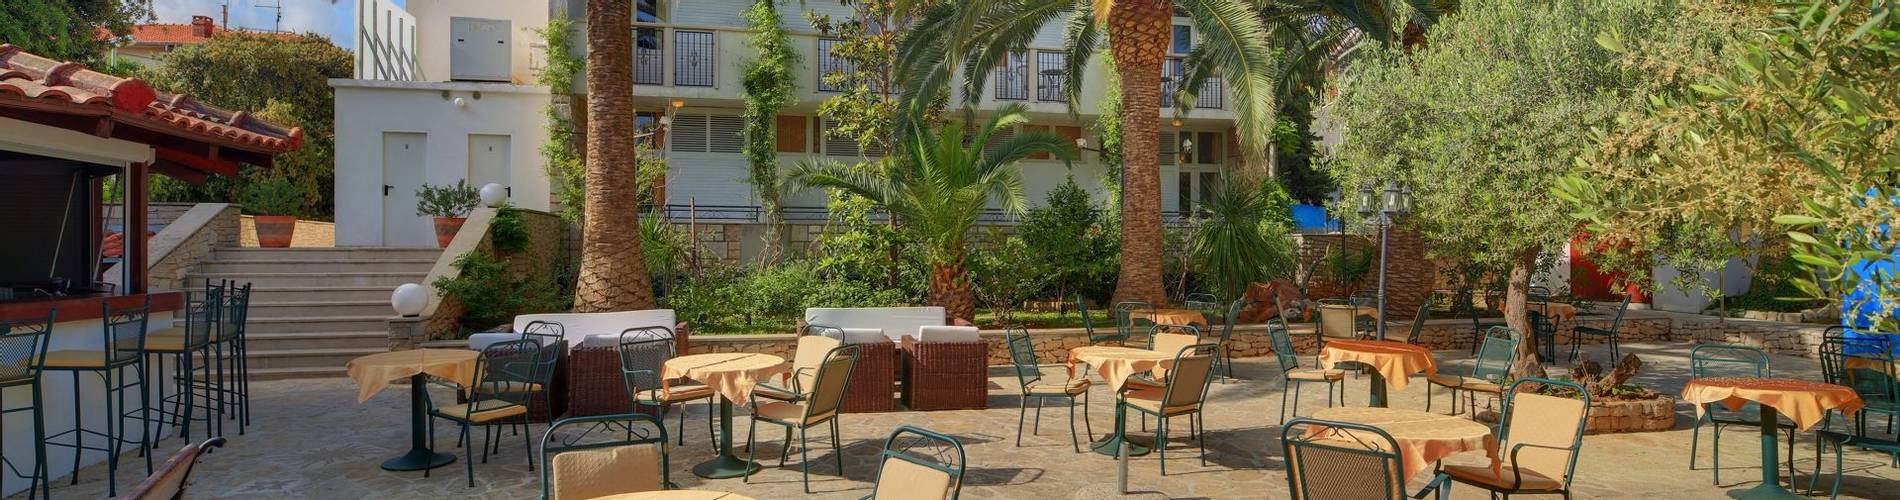 Hotel Villa ADRIATICA 2014 ZFacade Garden3 9X19  panorama 32MB.jpg